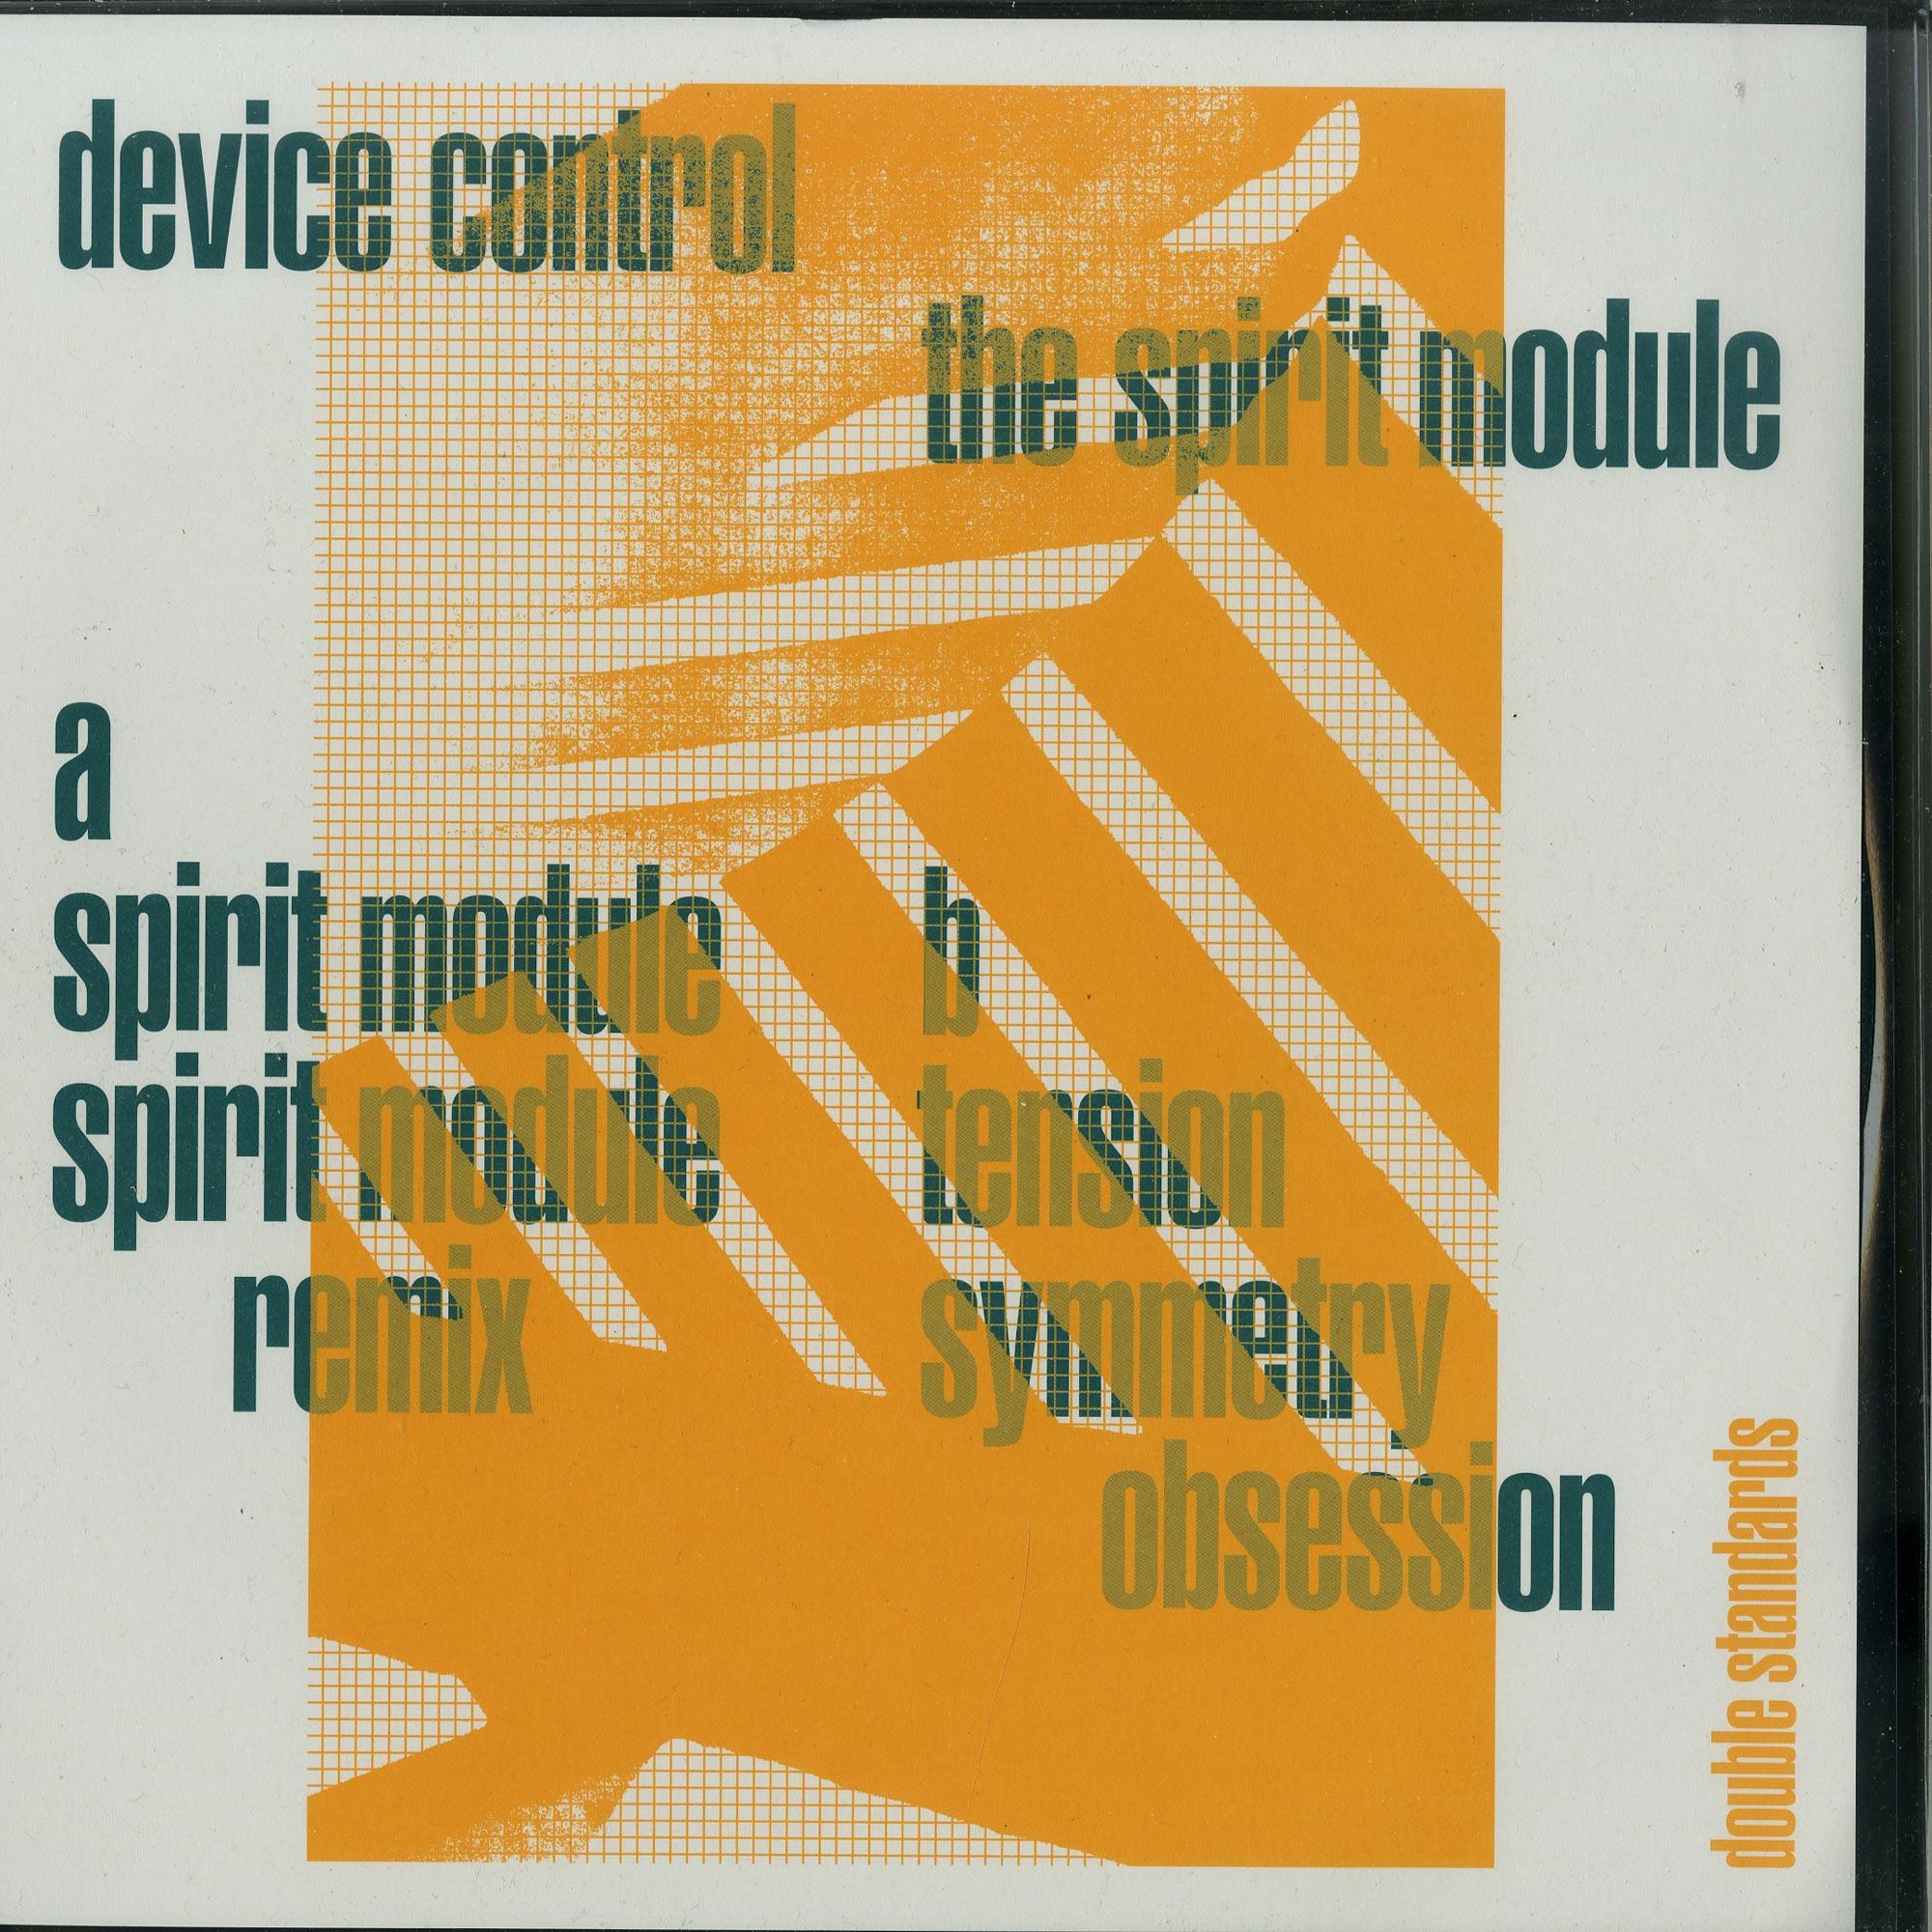 Device Control - THE SPIRIT MODULE